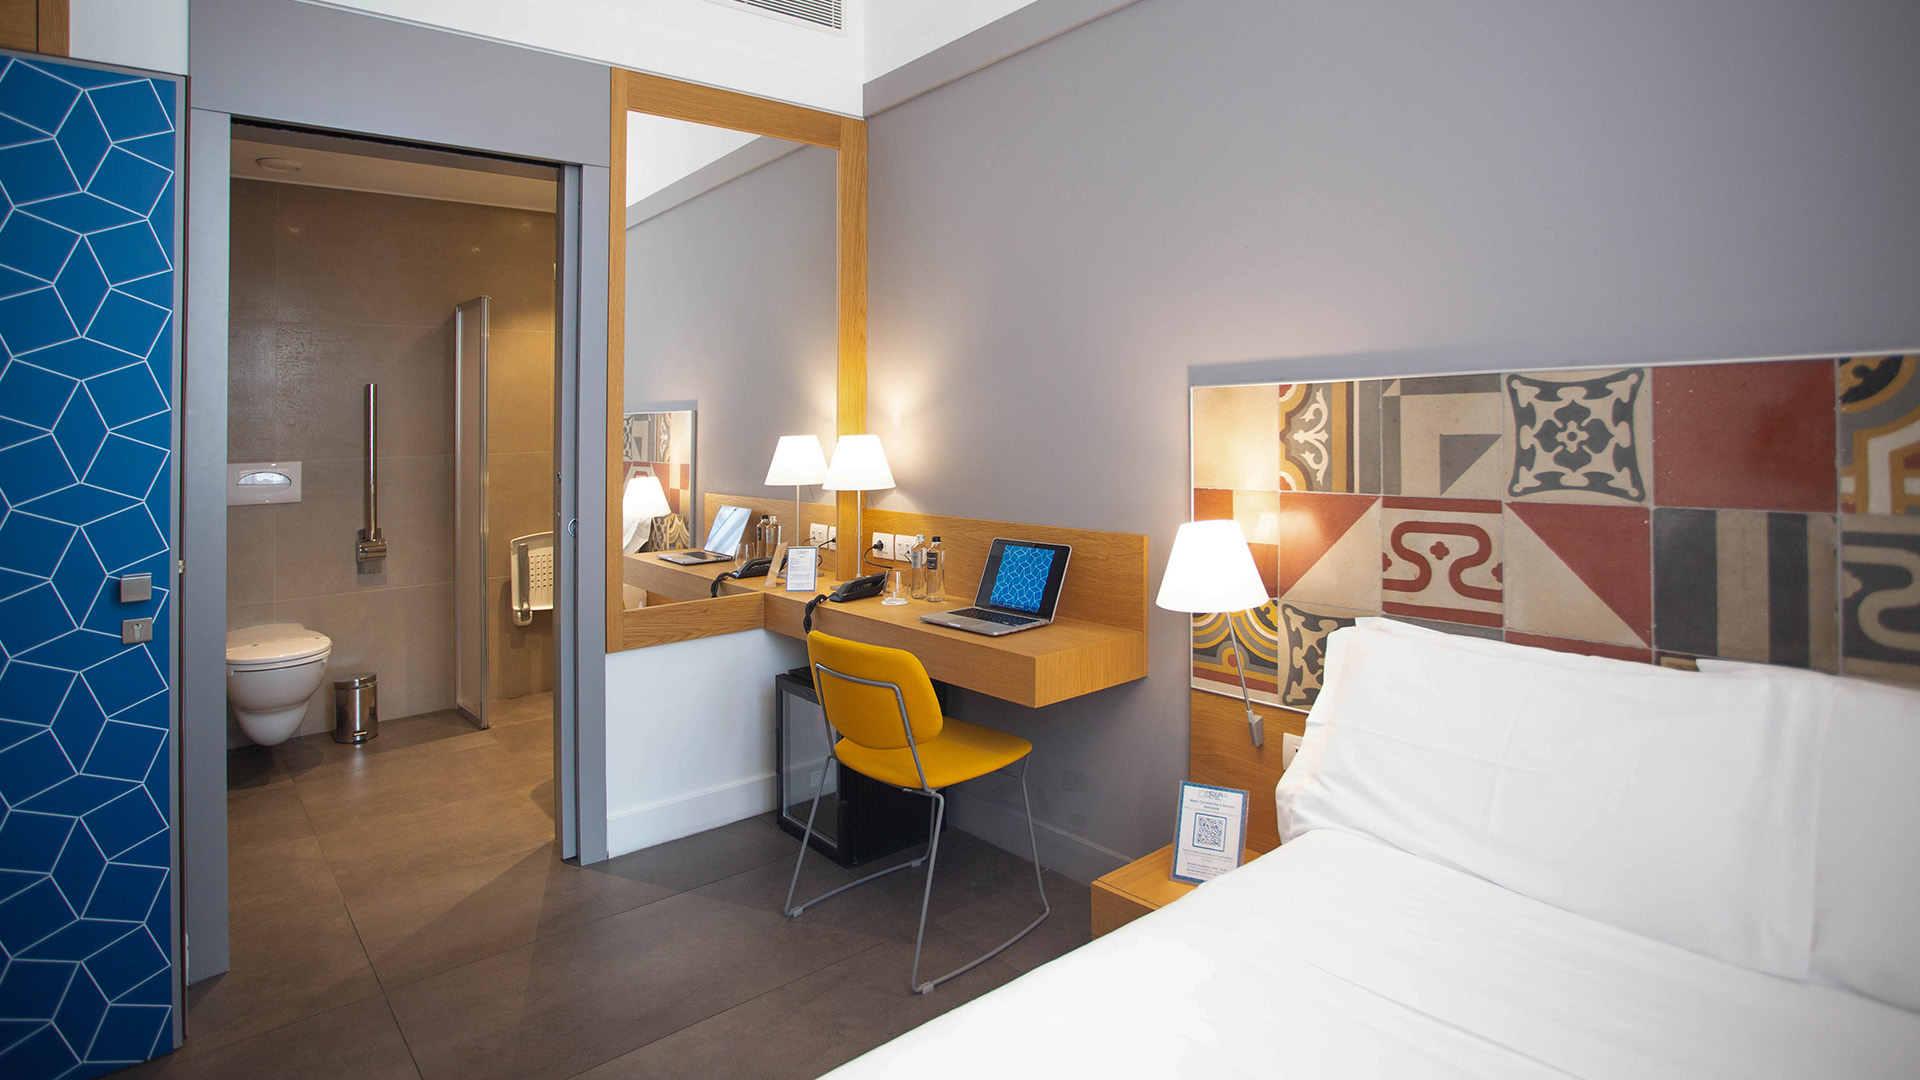 Hotel Medinblu-Standard Accesso Disabile-01